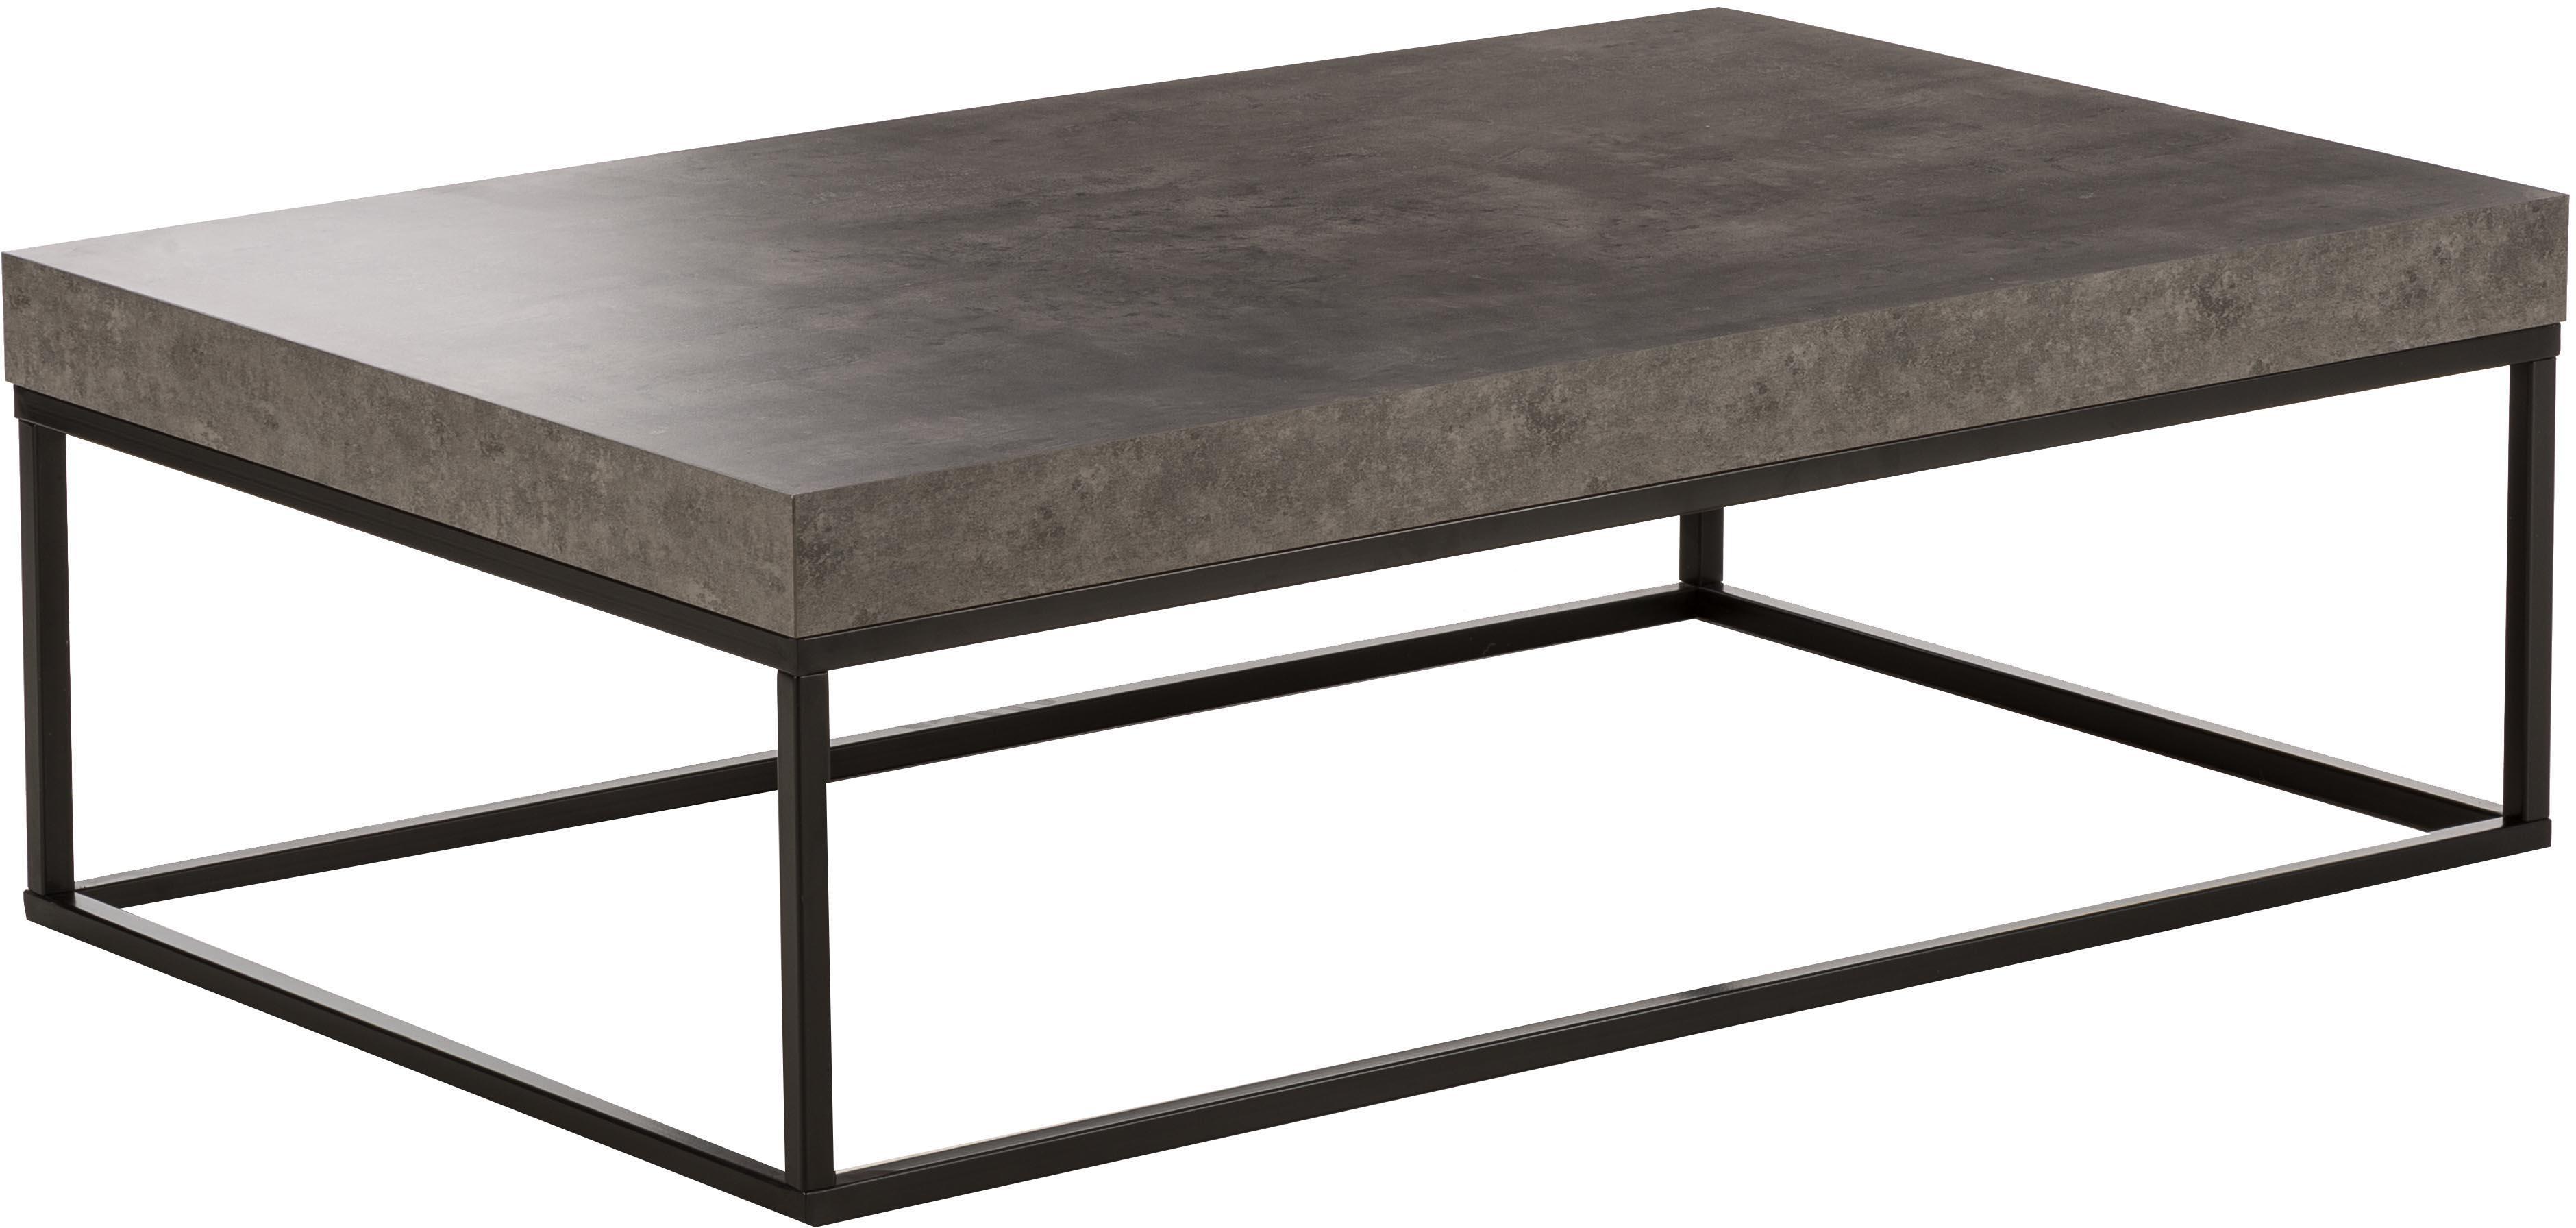 Mesa de centro en cemento Ellis, Tablero: estructura ligera de pana, Estructura: metal pintado, Negro, imitación de cemento, An 120 x F 38 cm